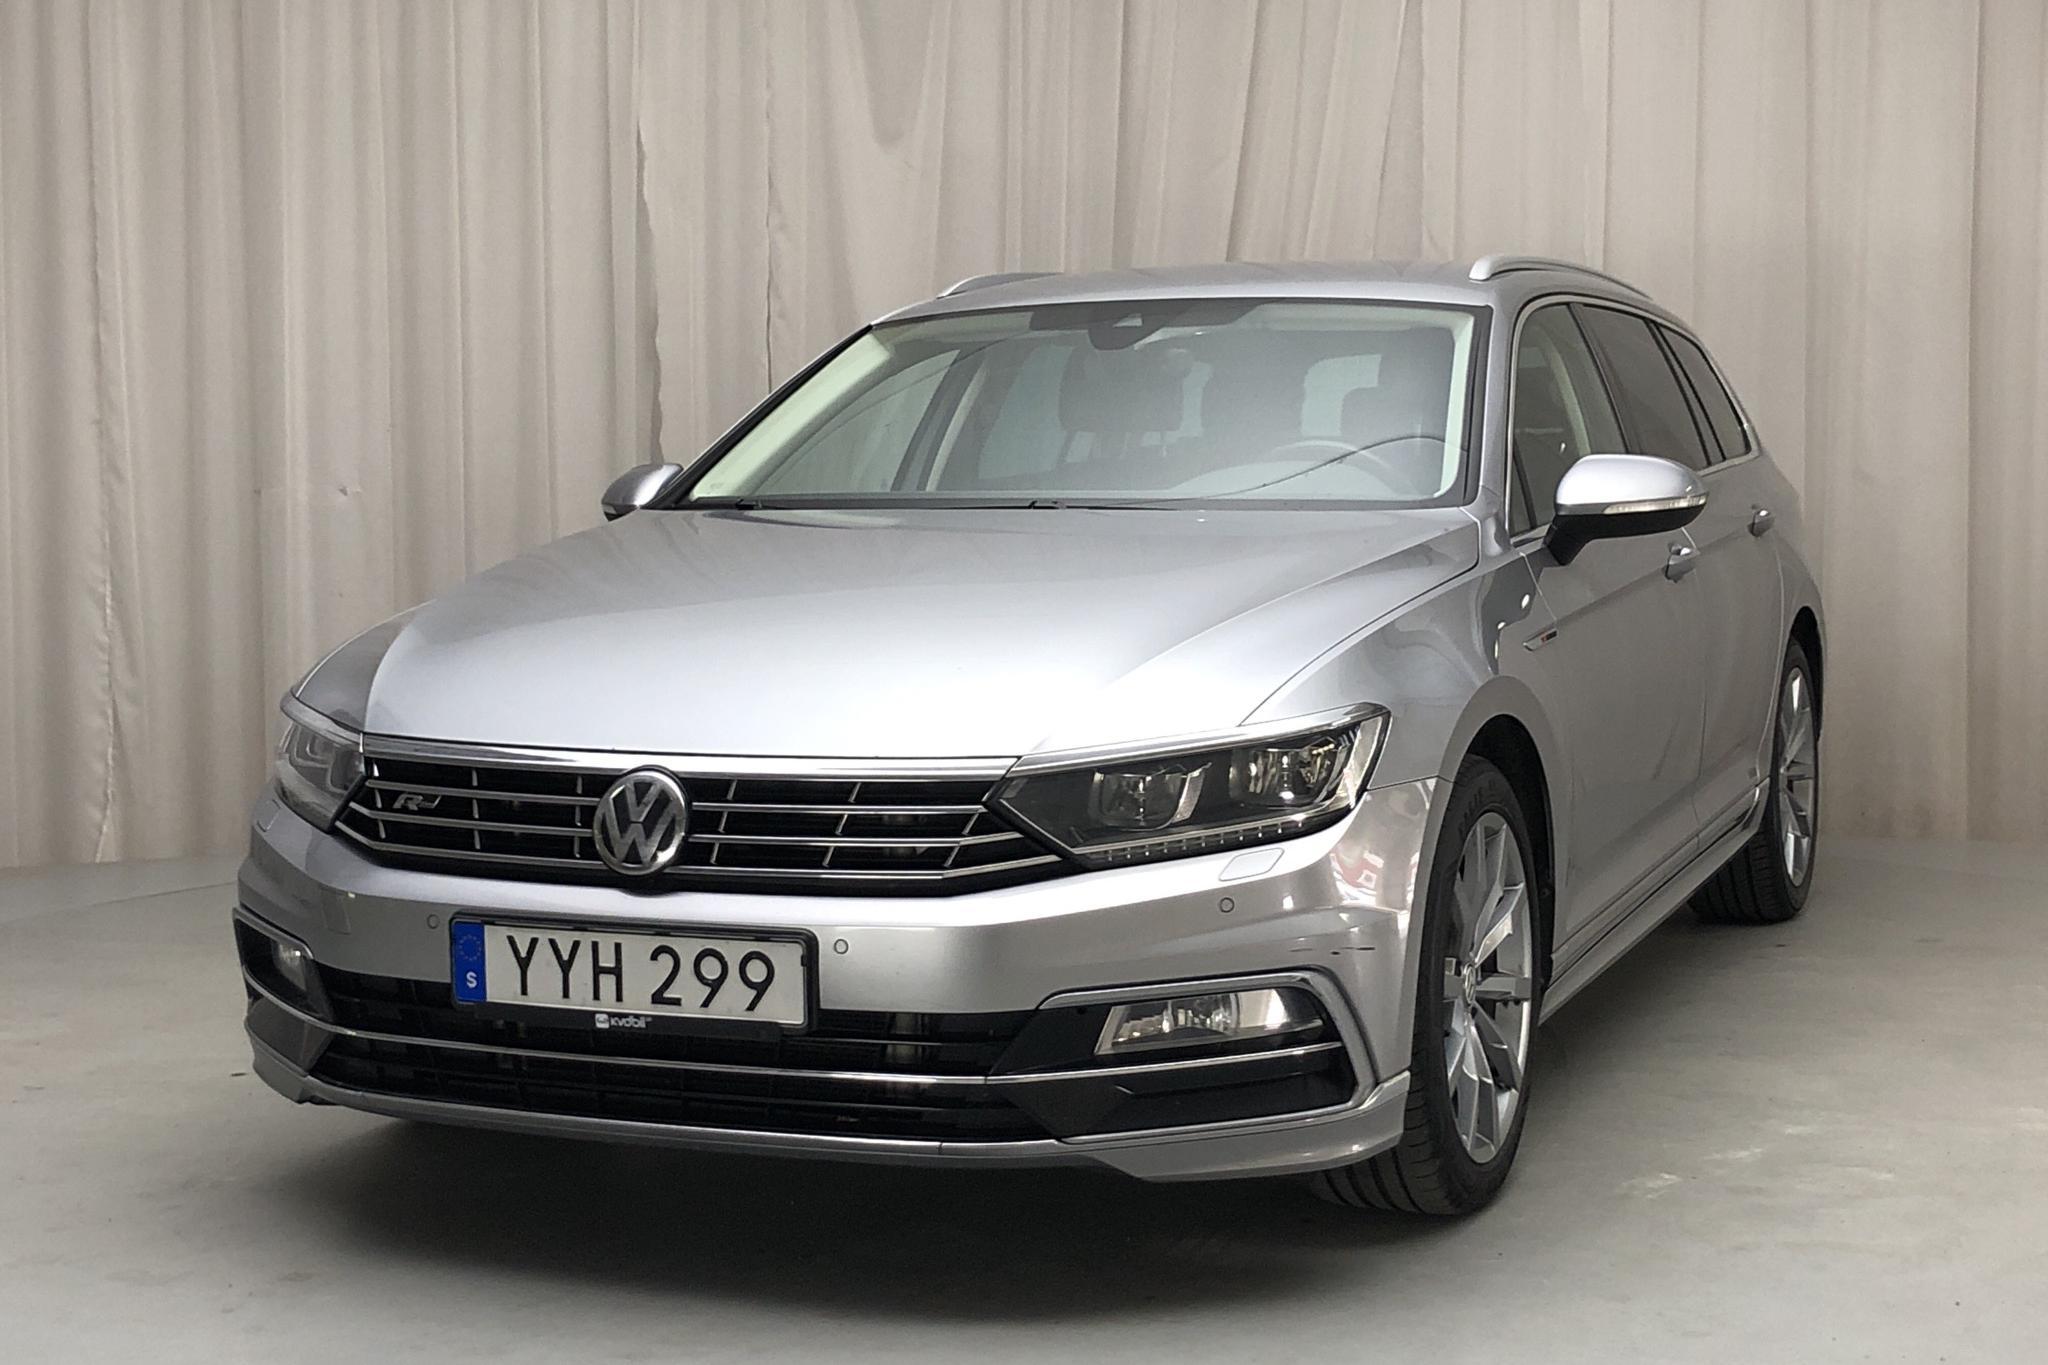 VW Passat 2.0 TDI Sportscombi 4MOTION (190hk) - 15 216 mil - Automat - silver - 2018